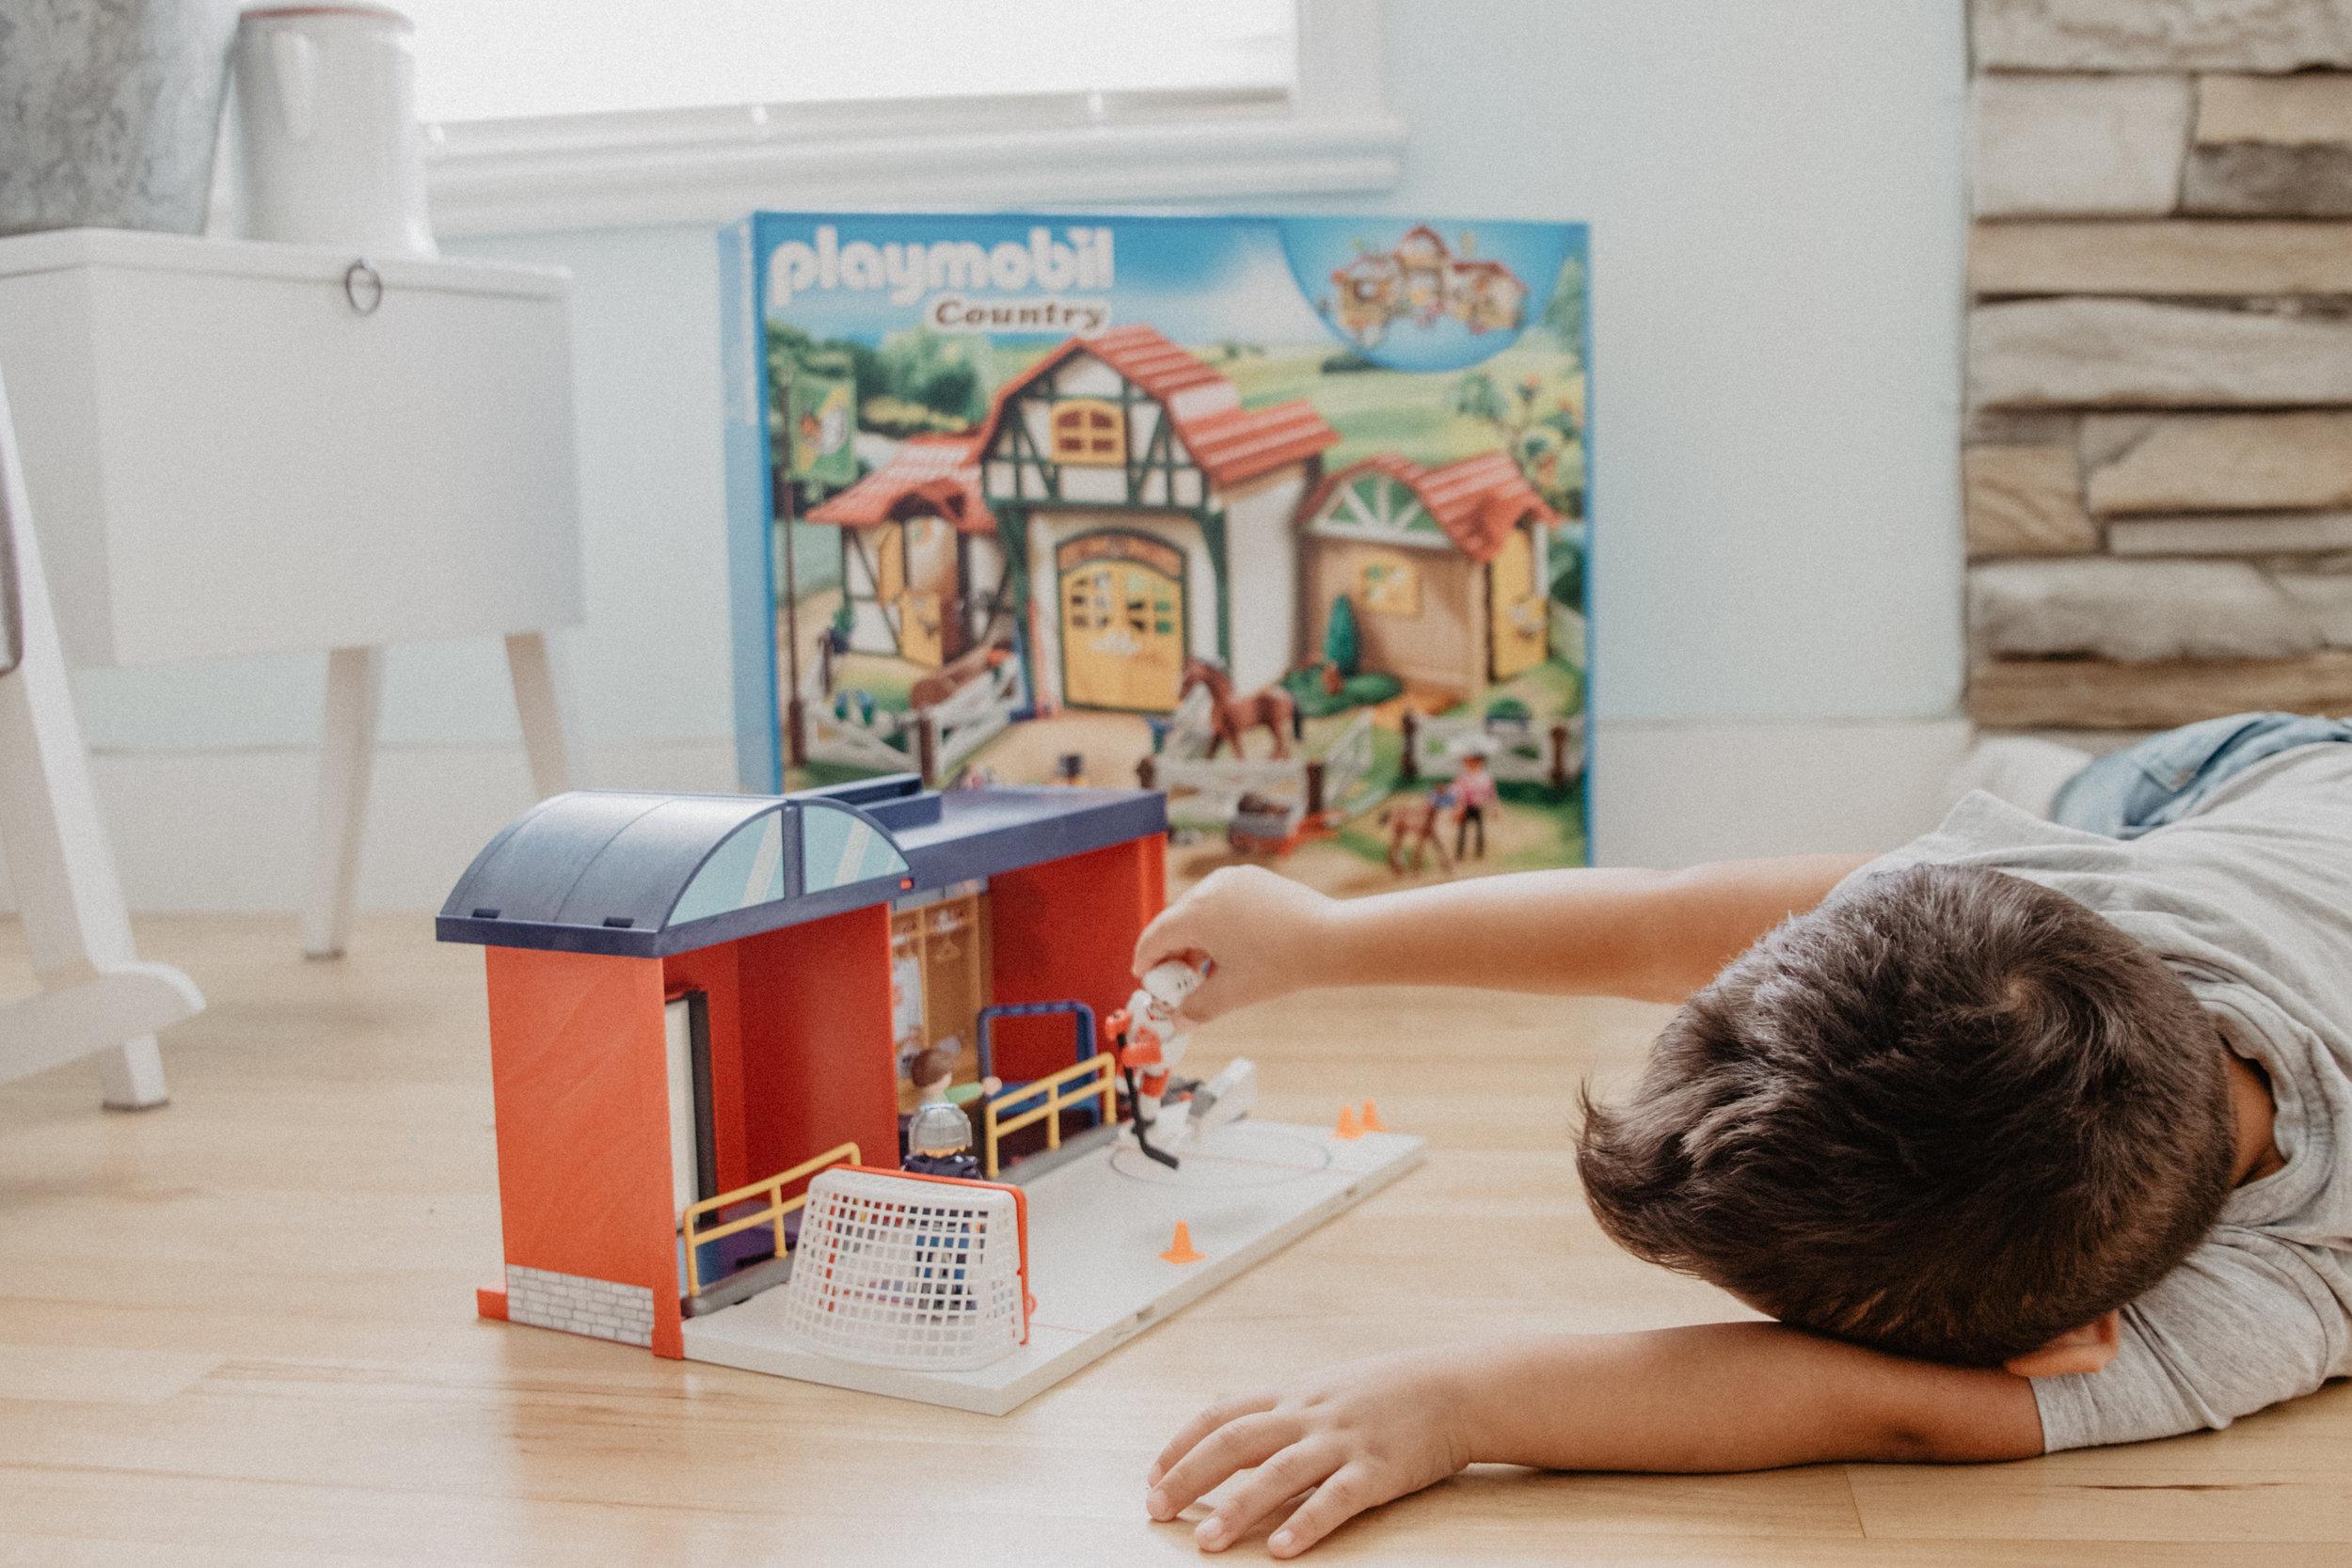 Playmobil Oct-4.jpg